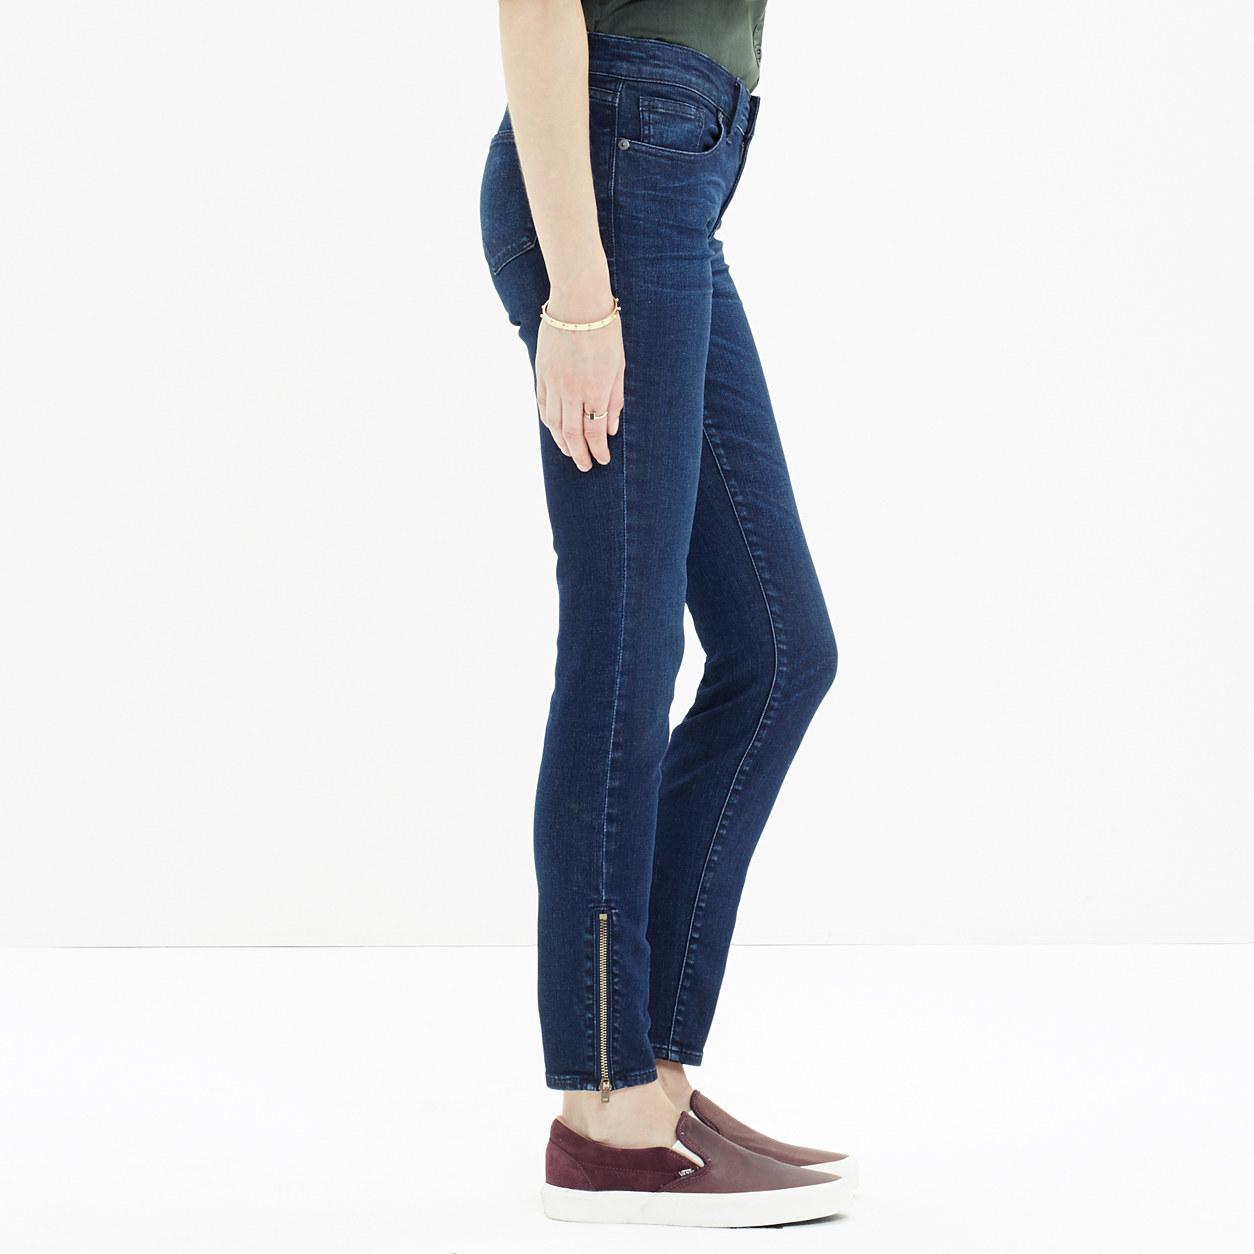 Skinny Skinny Zip Jeans in Edgewater Wash : skinny jeans | Madewell